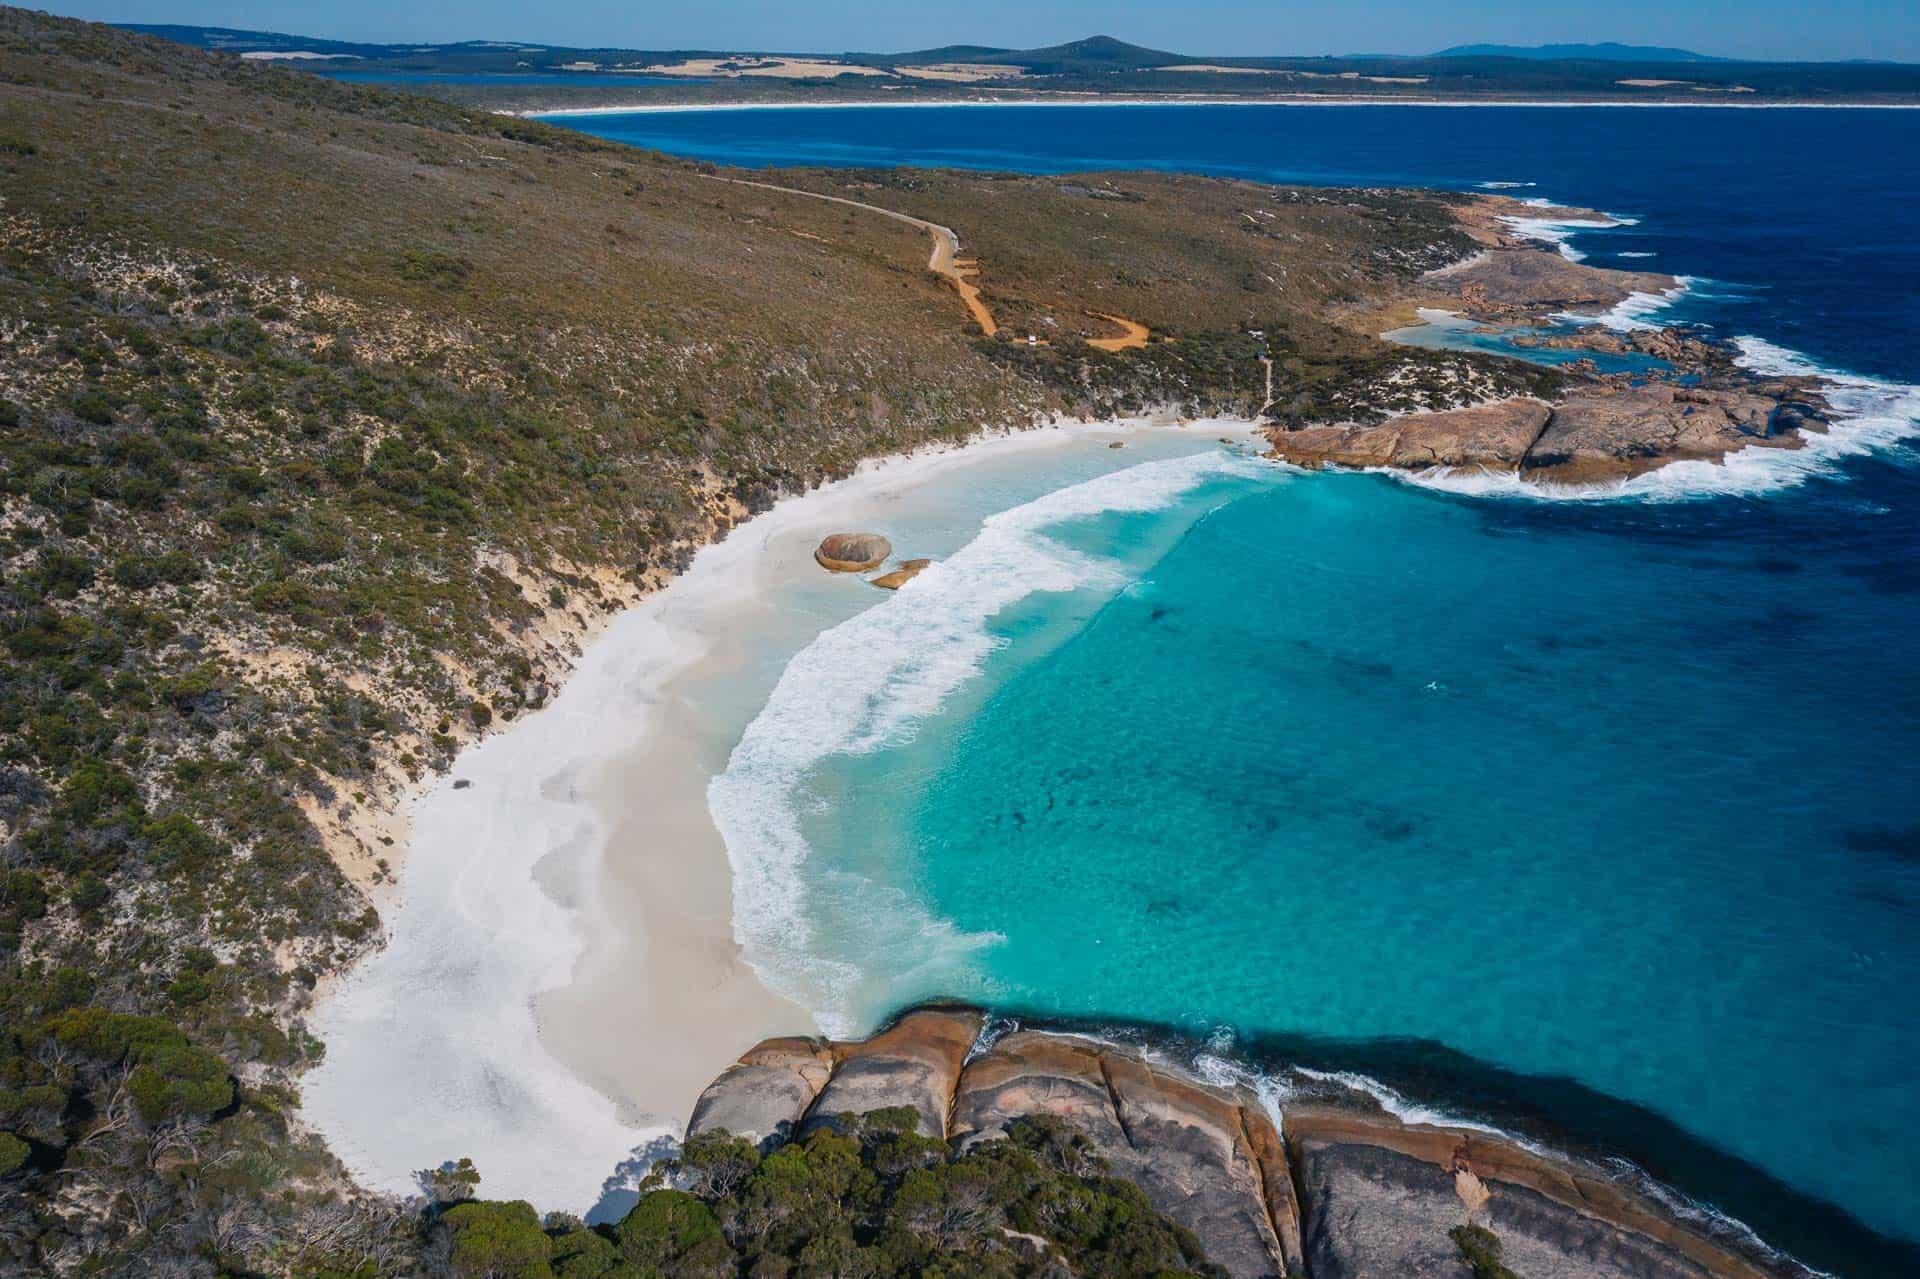 little beach albany, little beach wa, albany little beach, little beach western australia